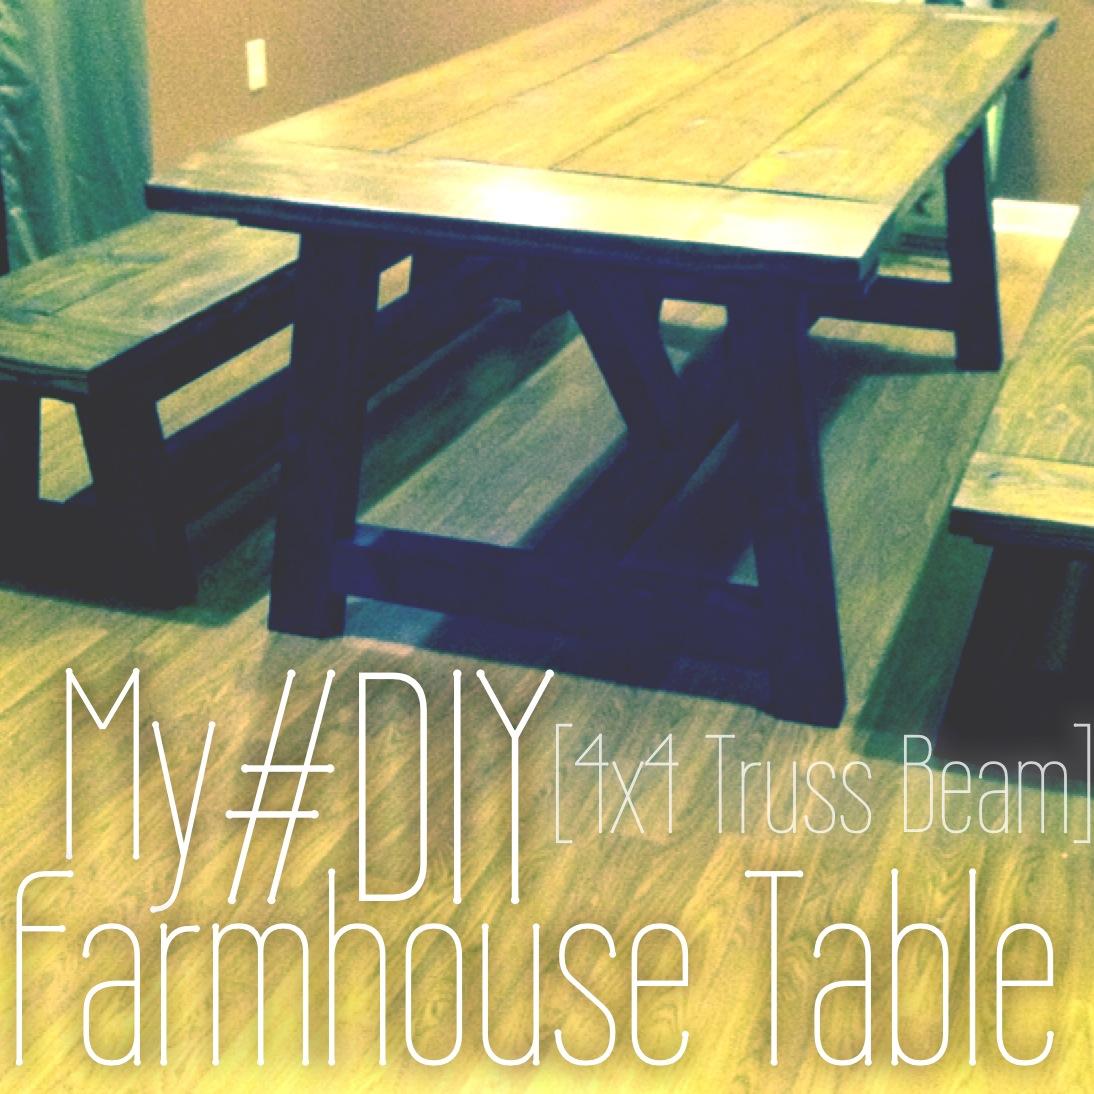 Magnificent My Diy Farmhouse Table 44 Truss Beam Thinking Out Loud Machost Co Dining Chair Design Ideas Machostcouk